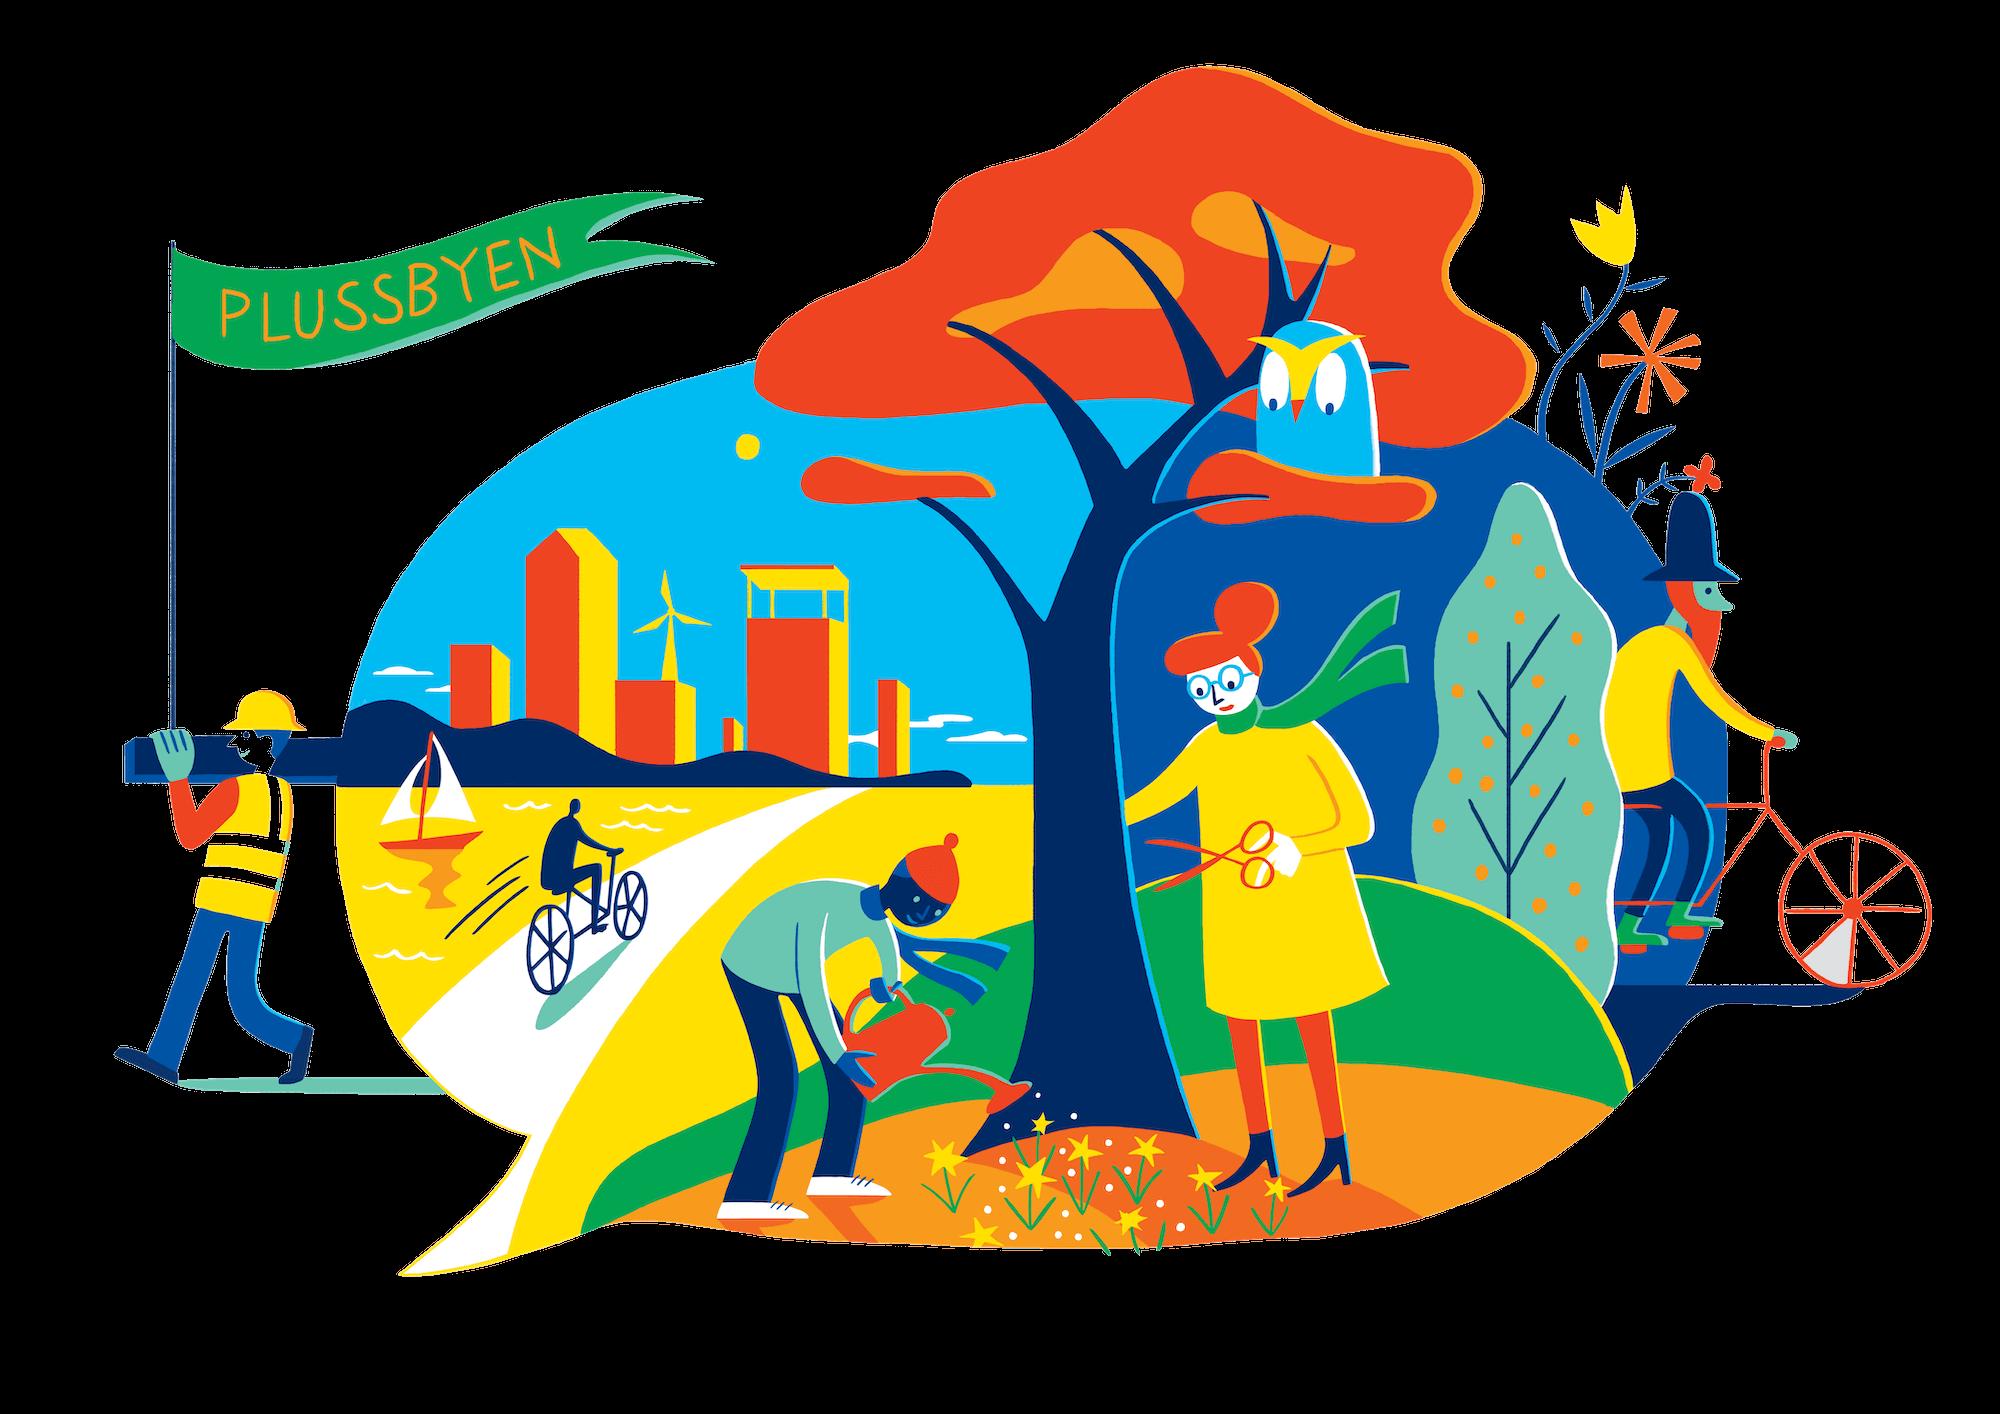 Illustration of a collaborative city